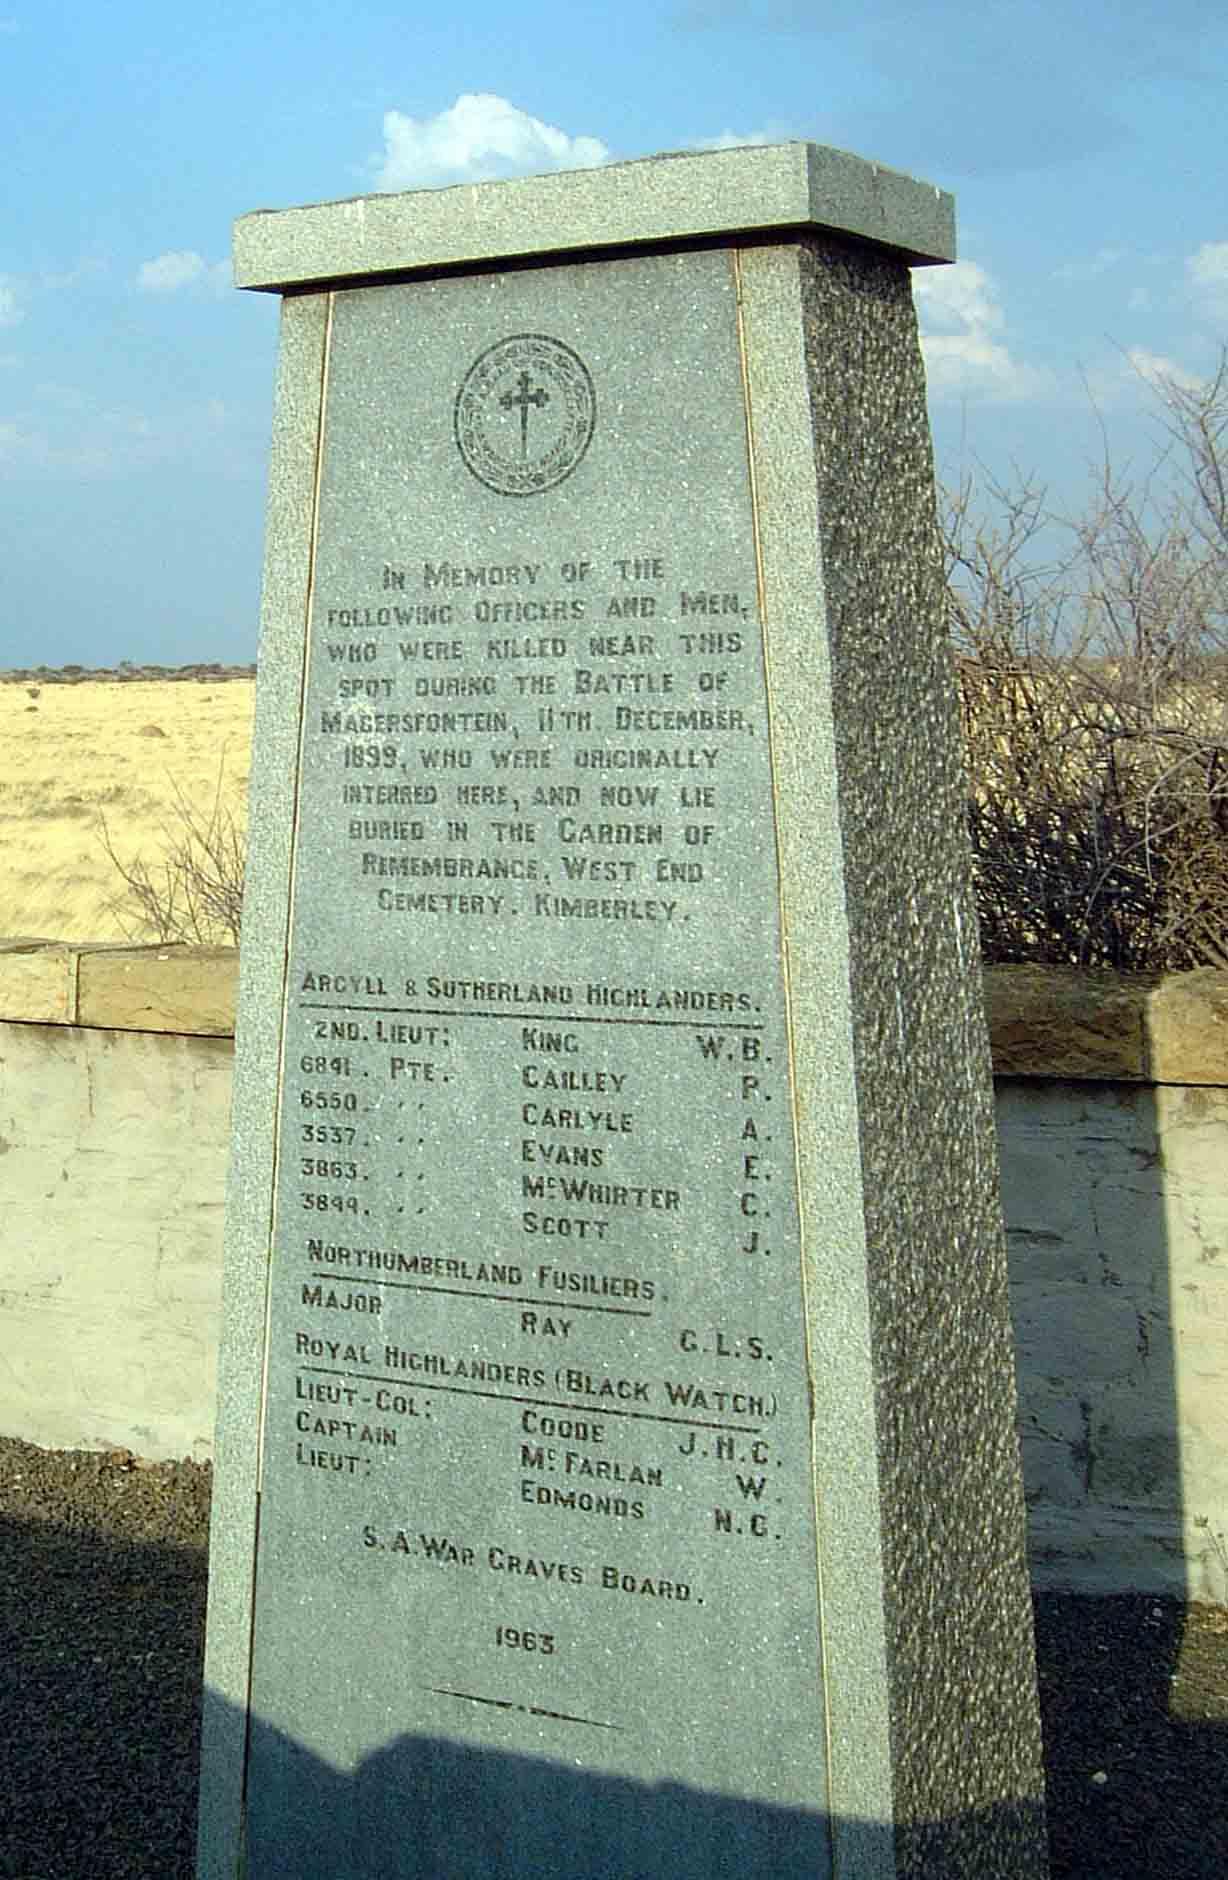 Magersfontein-memoriallr.jpg